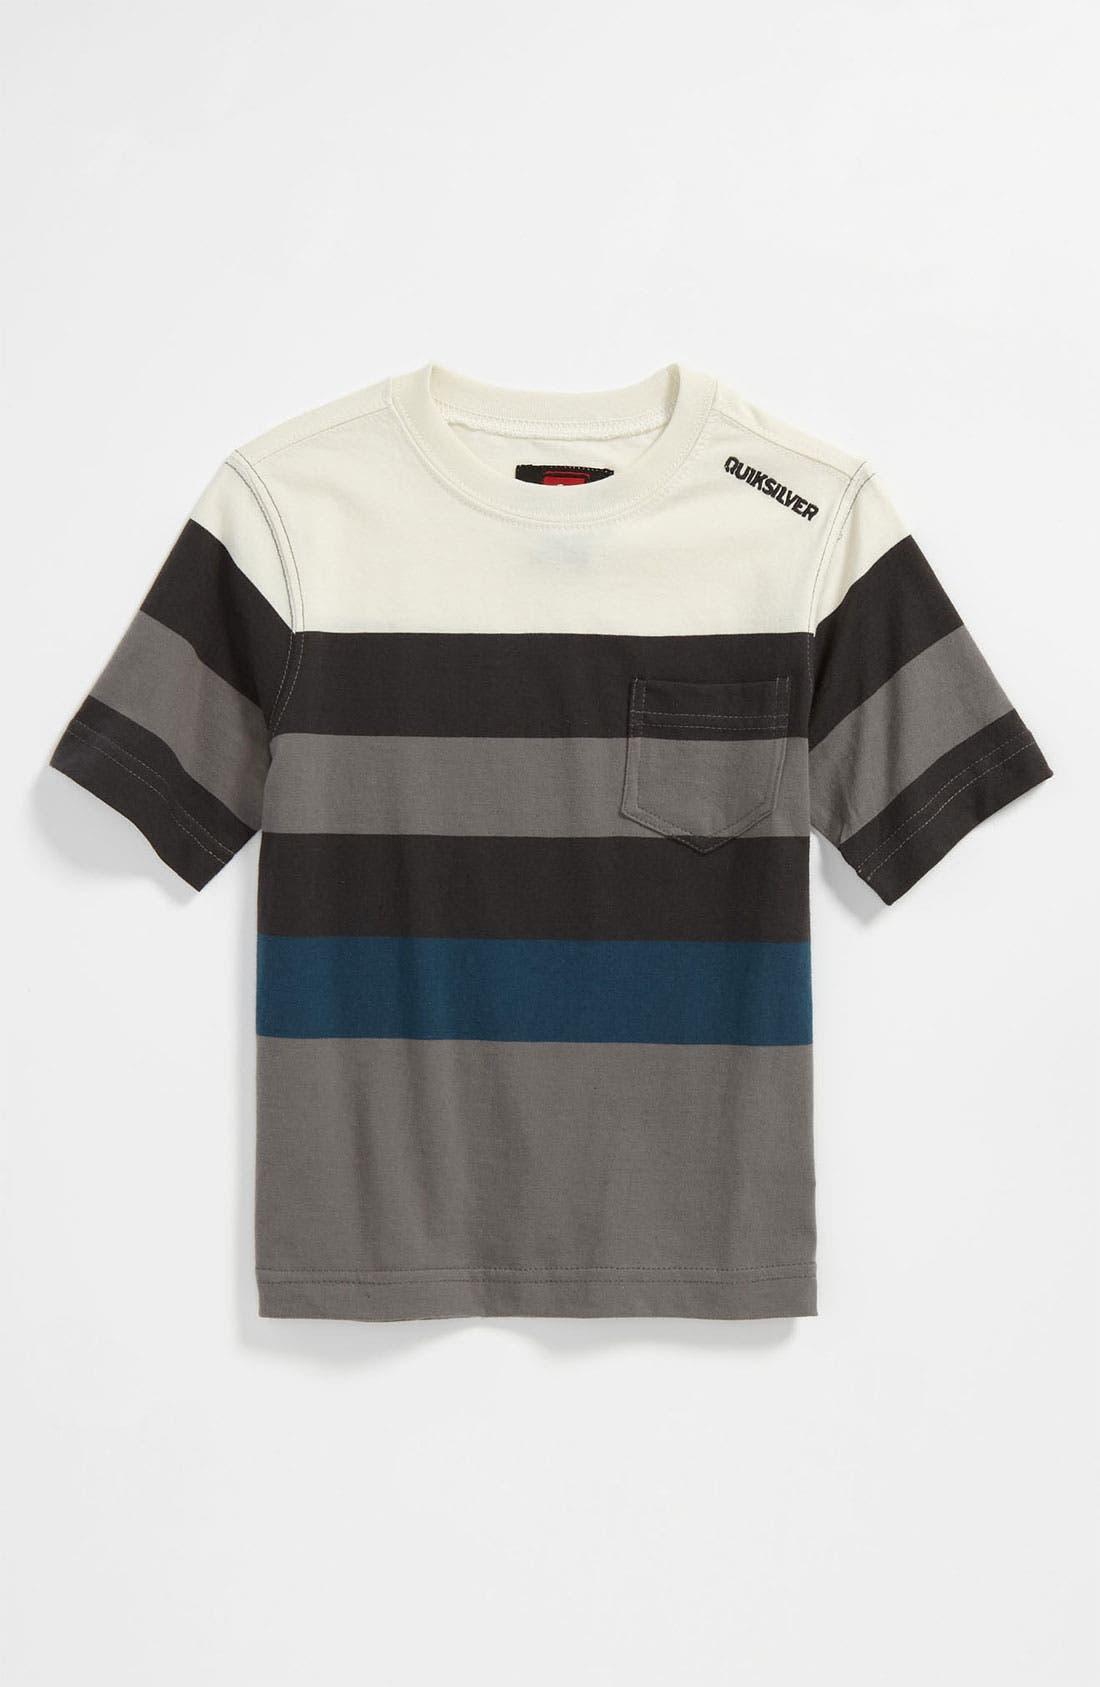 Main Image - Quiksilver 'Mobley' Stripe T-Shirt (Toddler)